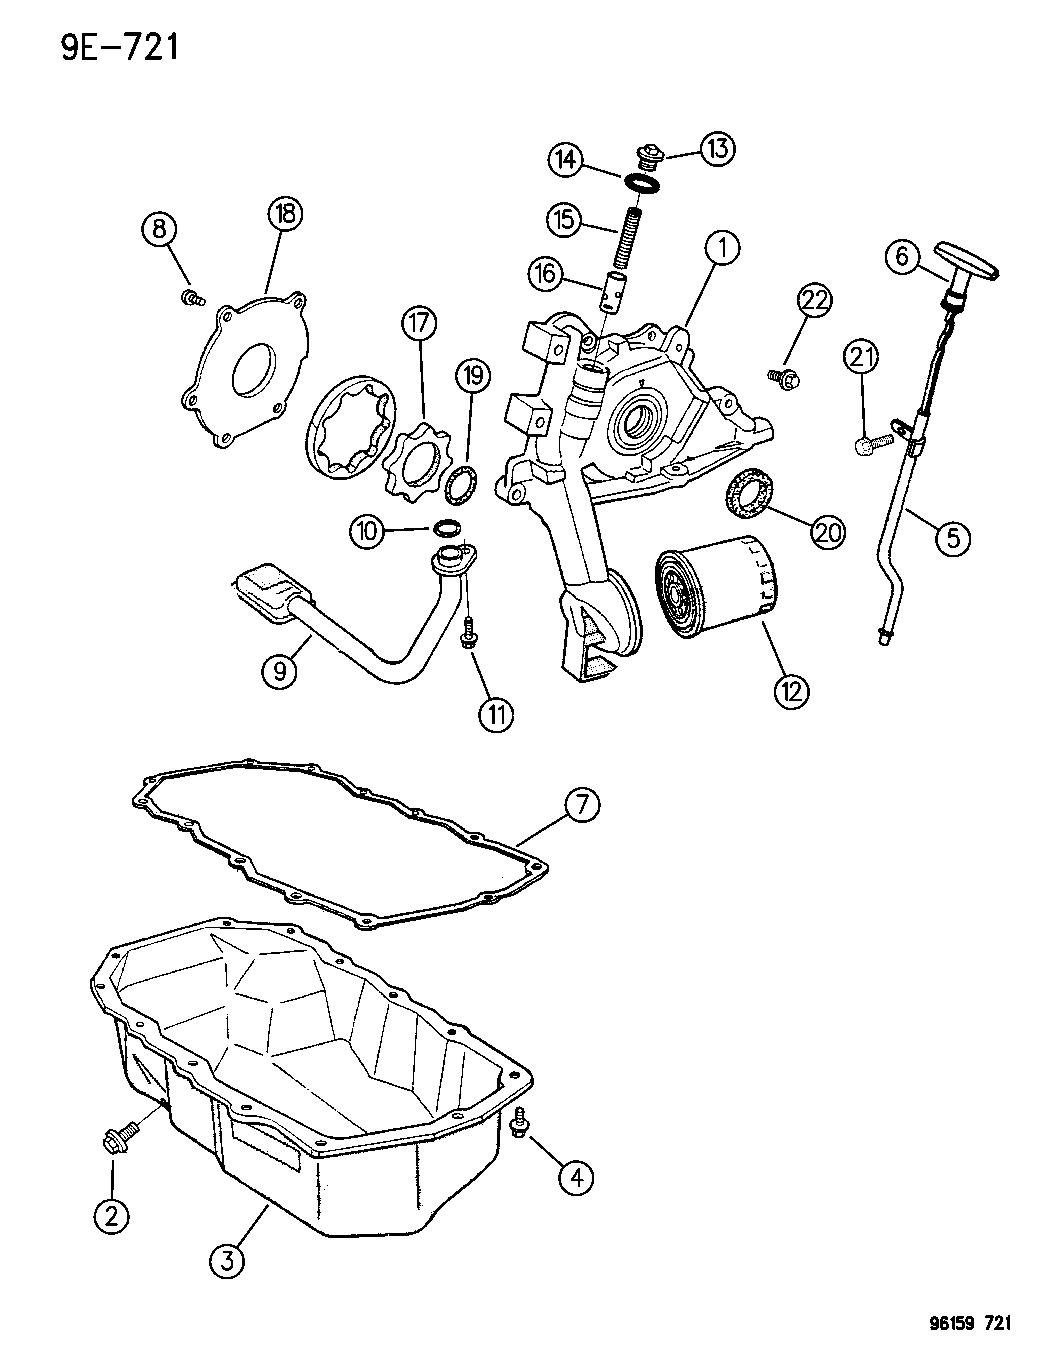 1996 chrysler sebring convertible engine oiling